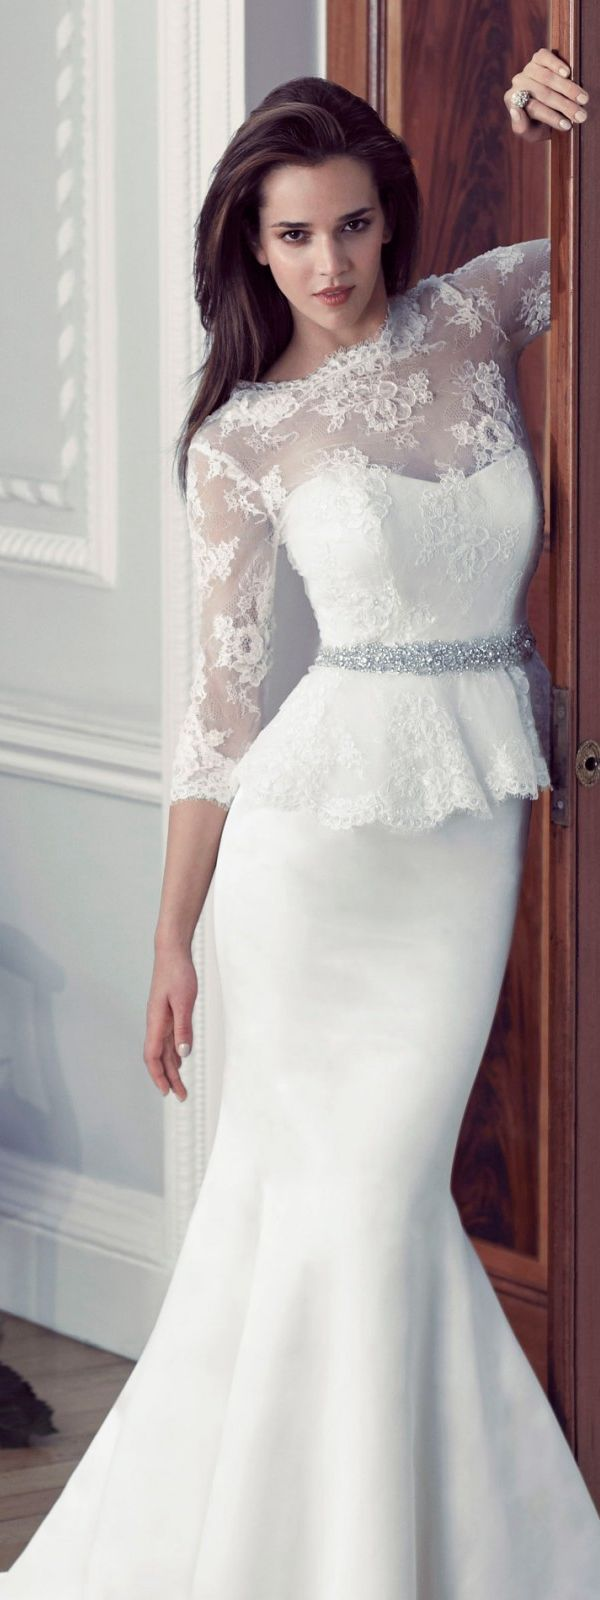 3/4 Sleeve Trumpet Satin Wedding Dress with Crystal Ribbon